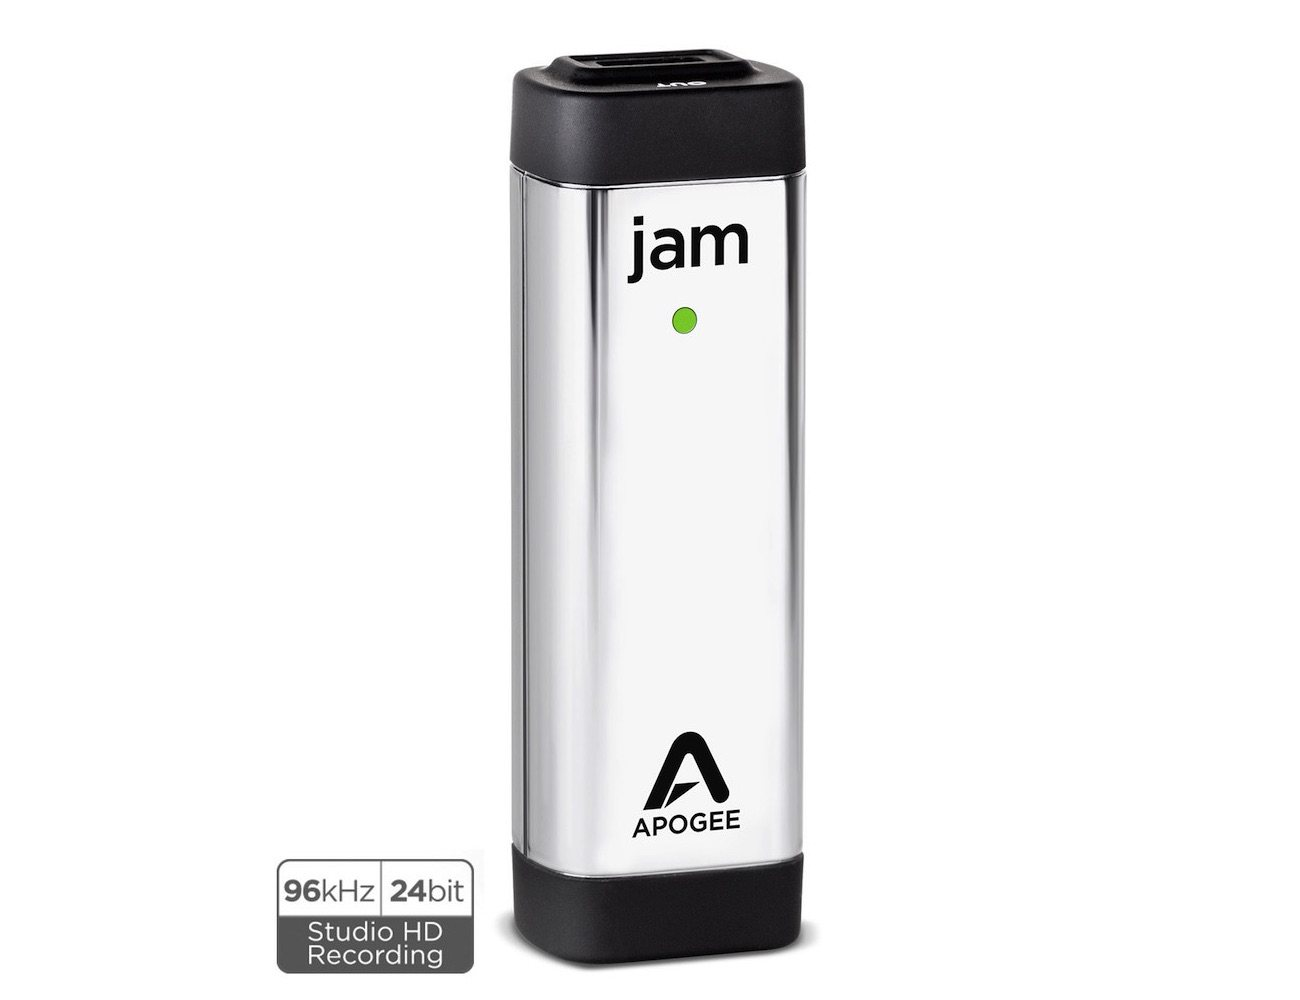 Apogee JAM - Recording a band on Vimeo